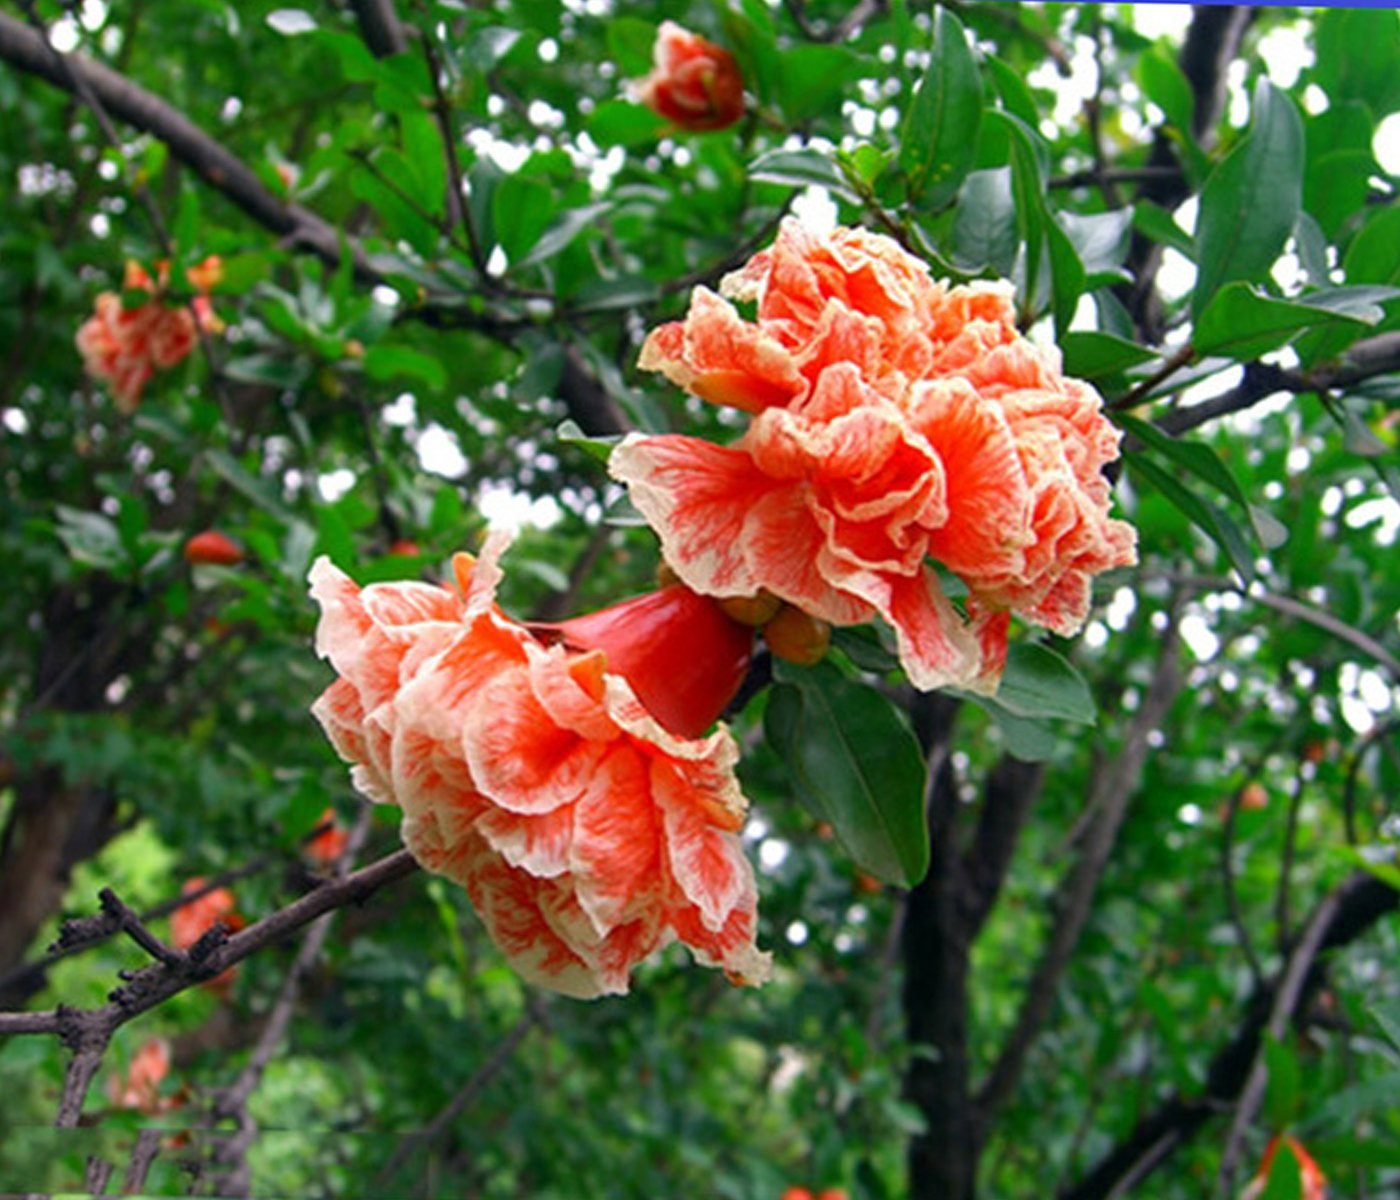 Best Garden Seeds Heirloom wu hua 'white orange pomegranate flower seeds, Professional Service Pack, 20 Seeds / Pack, Light Fragrant Flowers shrub Punica by Best Garden Seeds